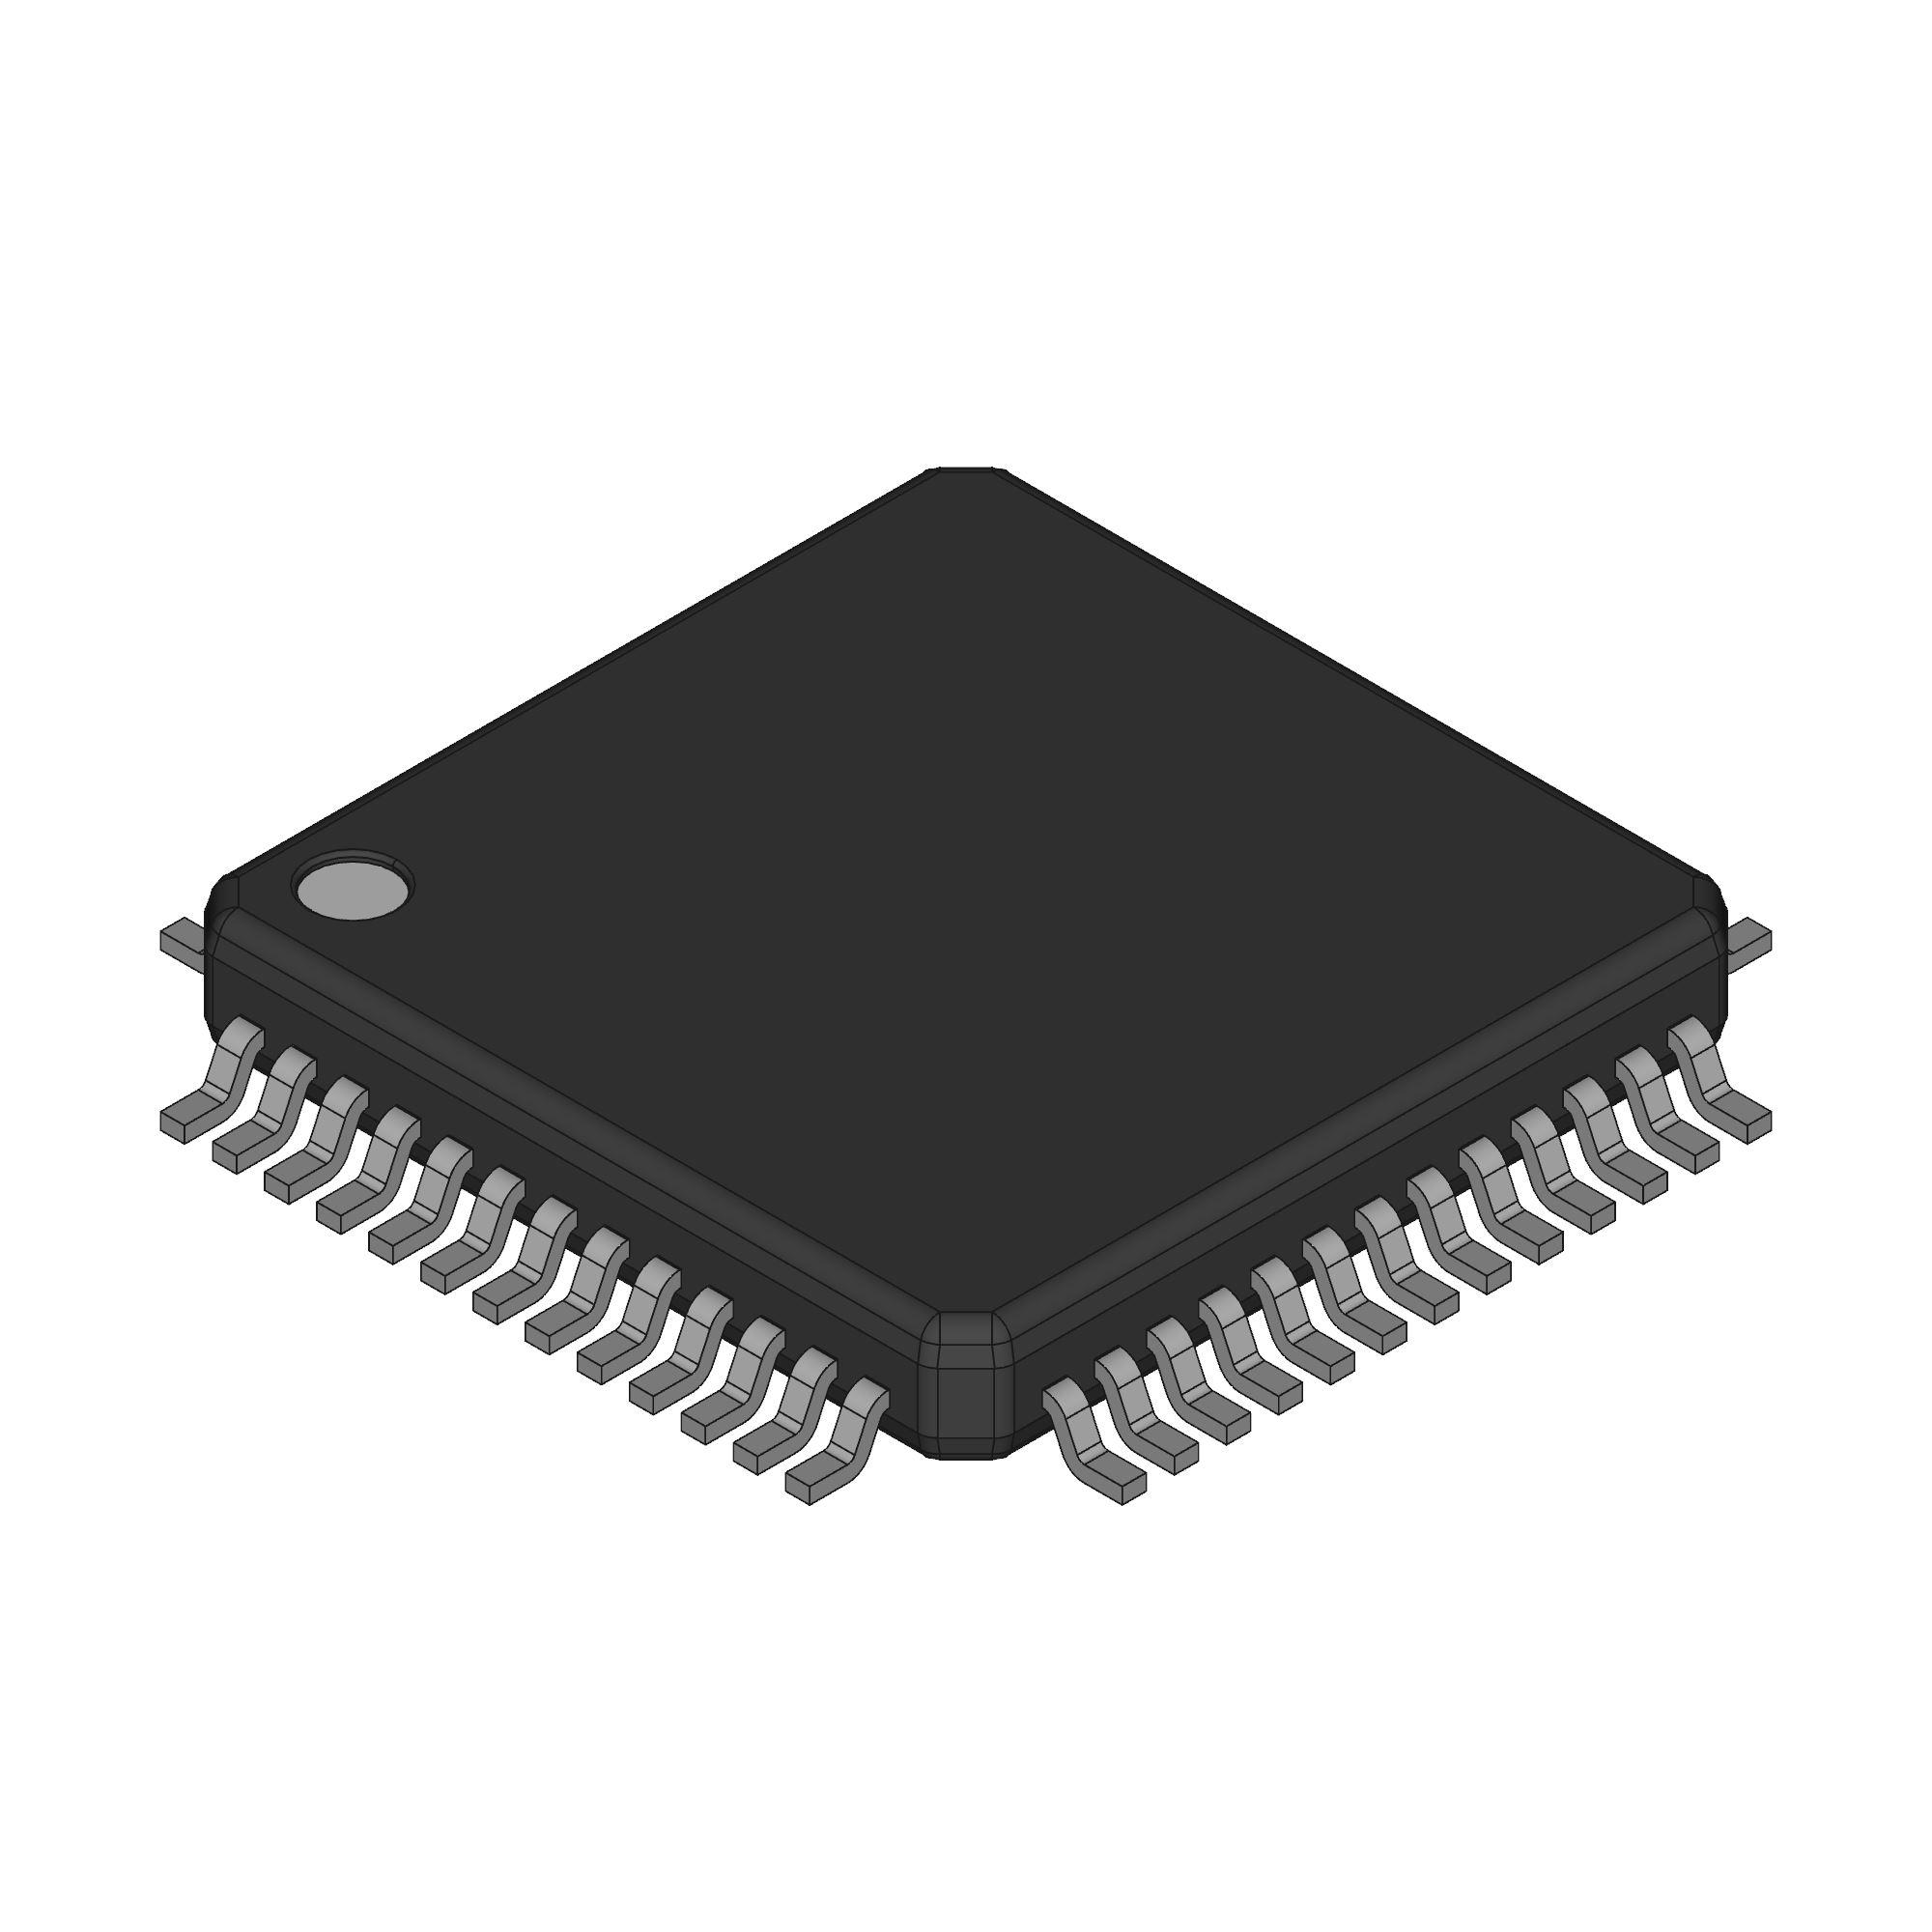 AD5361BSTZ by Analog Devices   DAC   Arrow.com